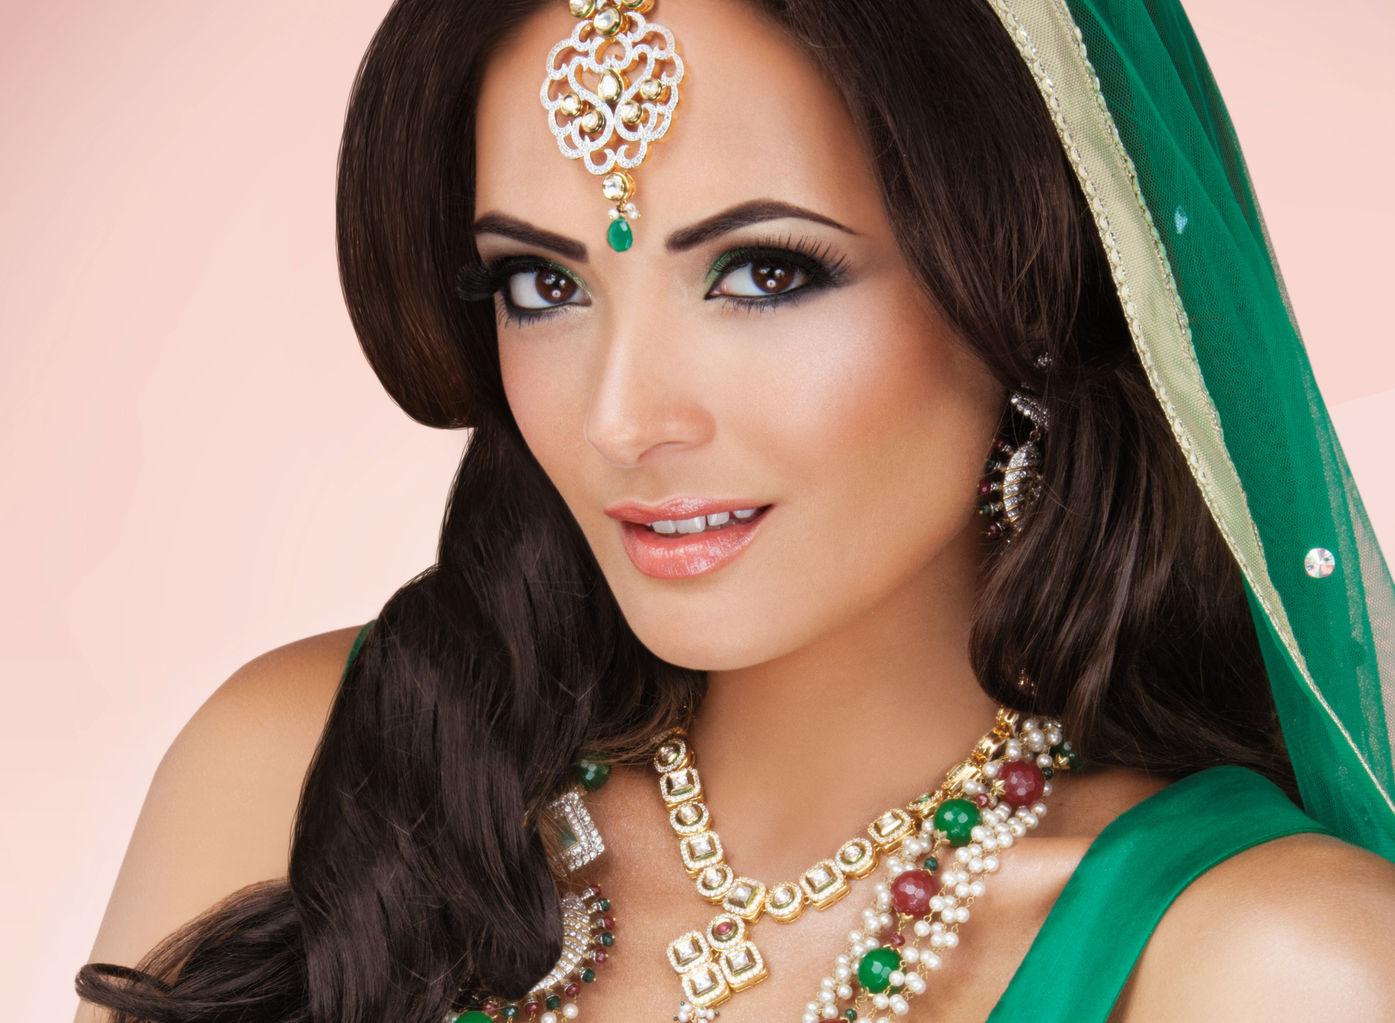 indian bridal hair and makeup west london - short hair fashions